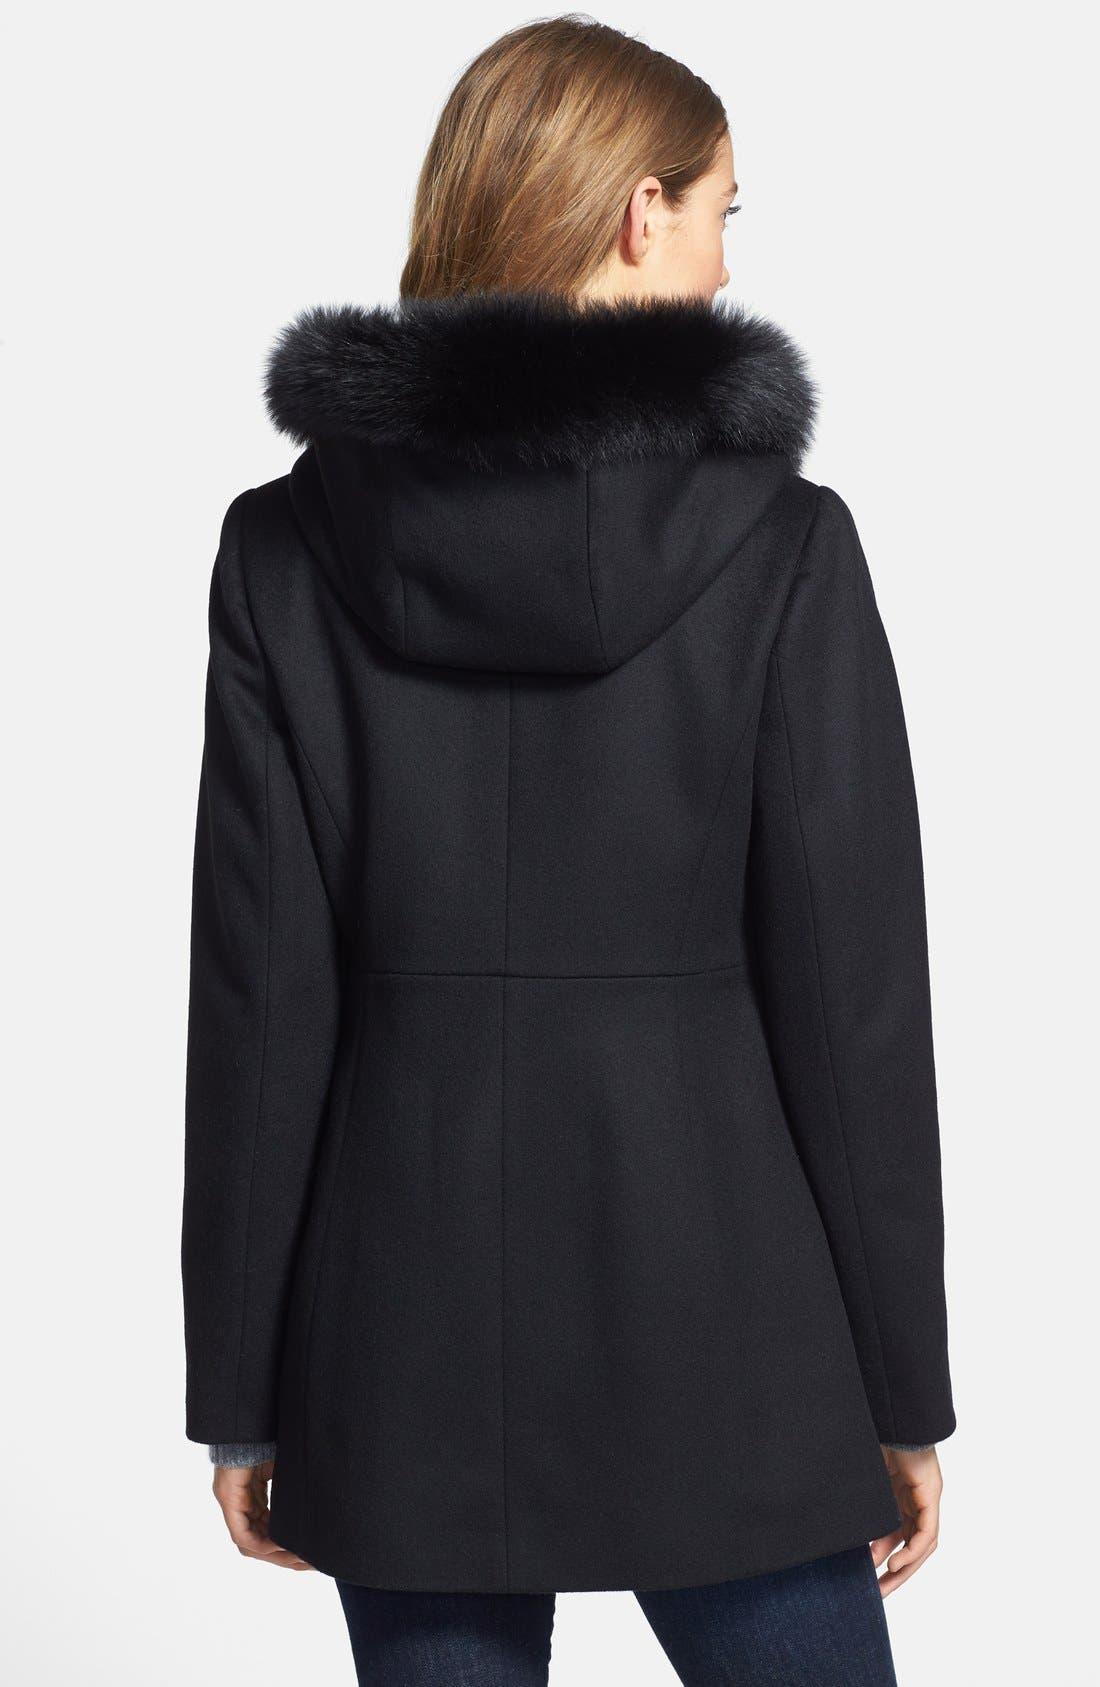 Genuine Fox Fur Trim Hooded Wool Blend Coat,                             Alternate thumbnail 8, color,                             001